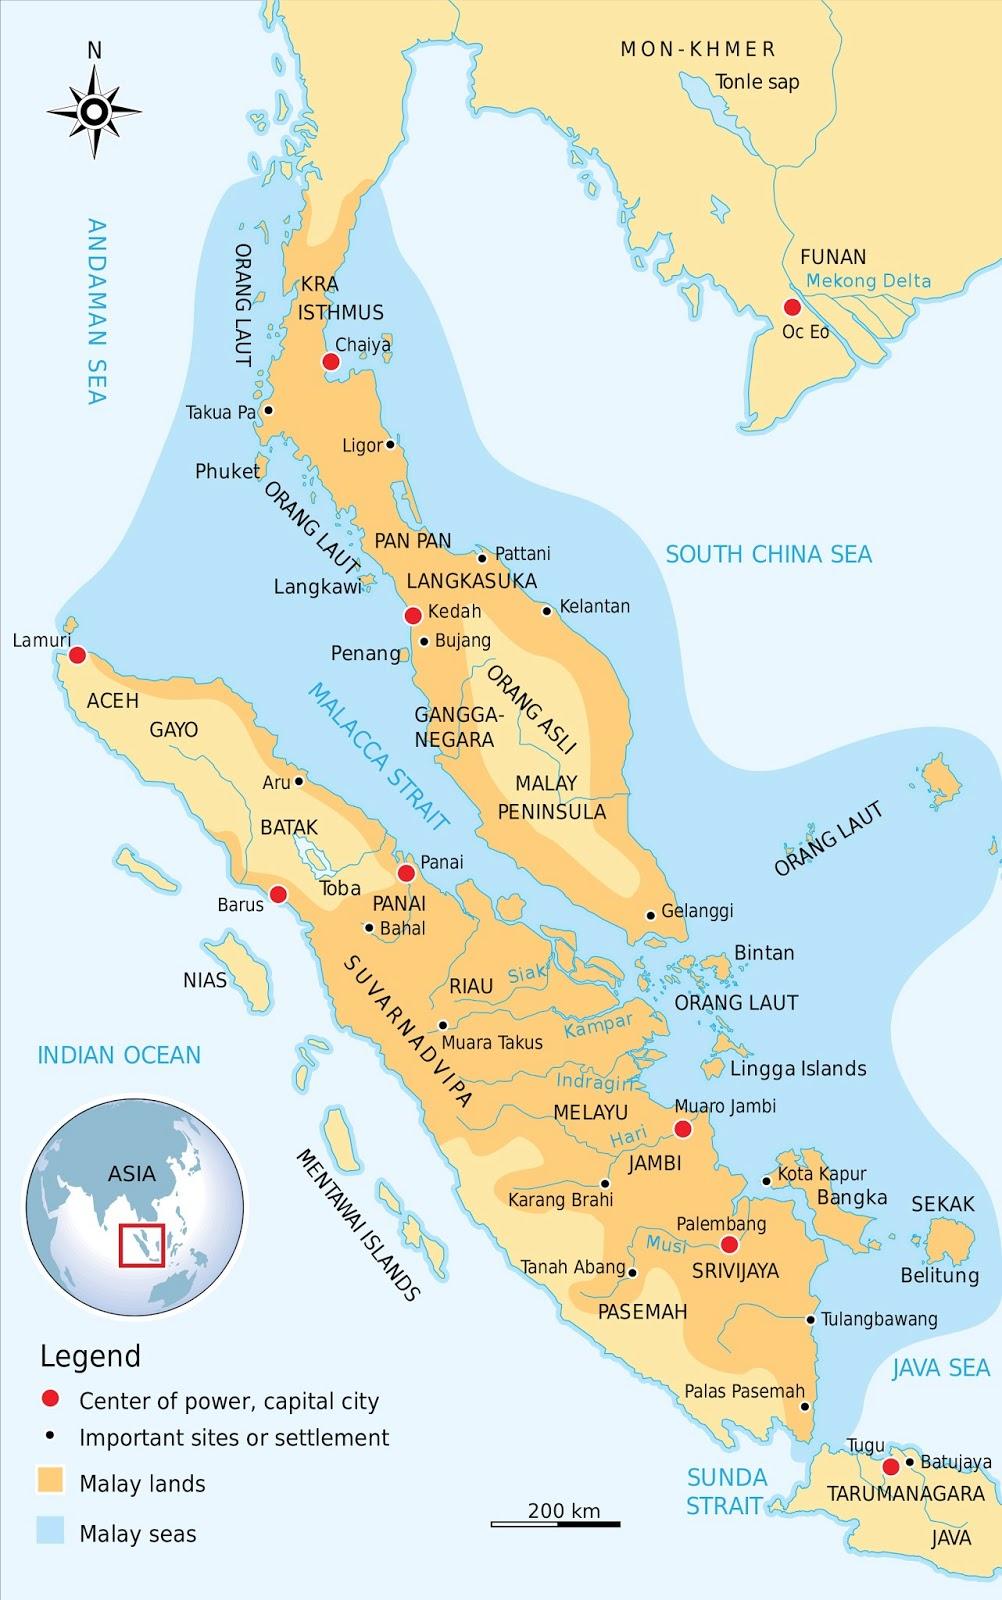 Geografika Nusantara: The Ancient Kingdoms of Sumatra on deep soul, deep love, deep forest, deep nature,